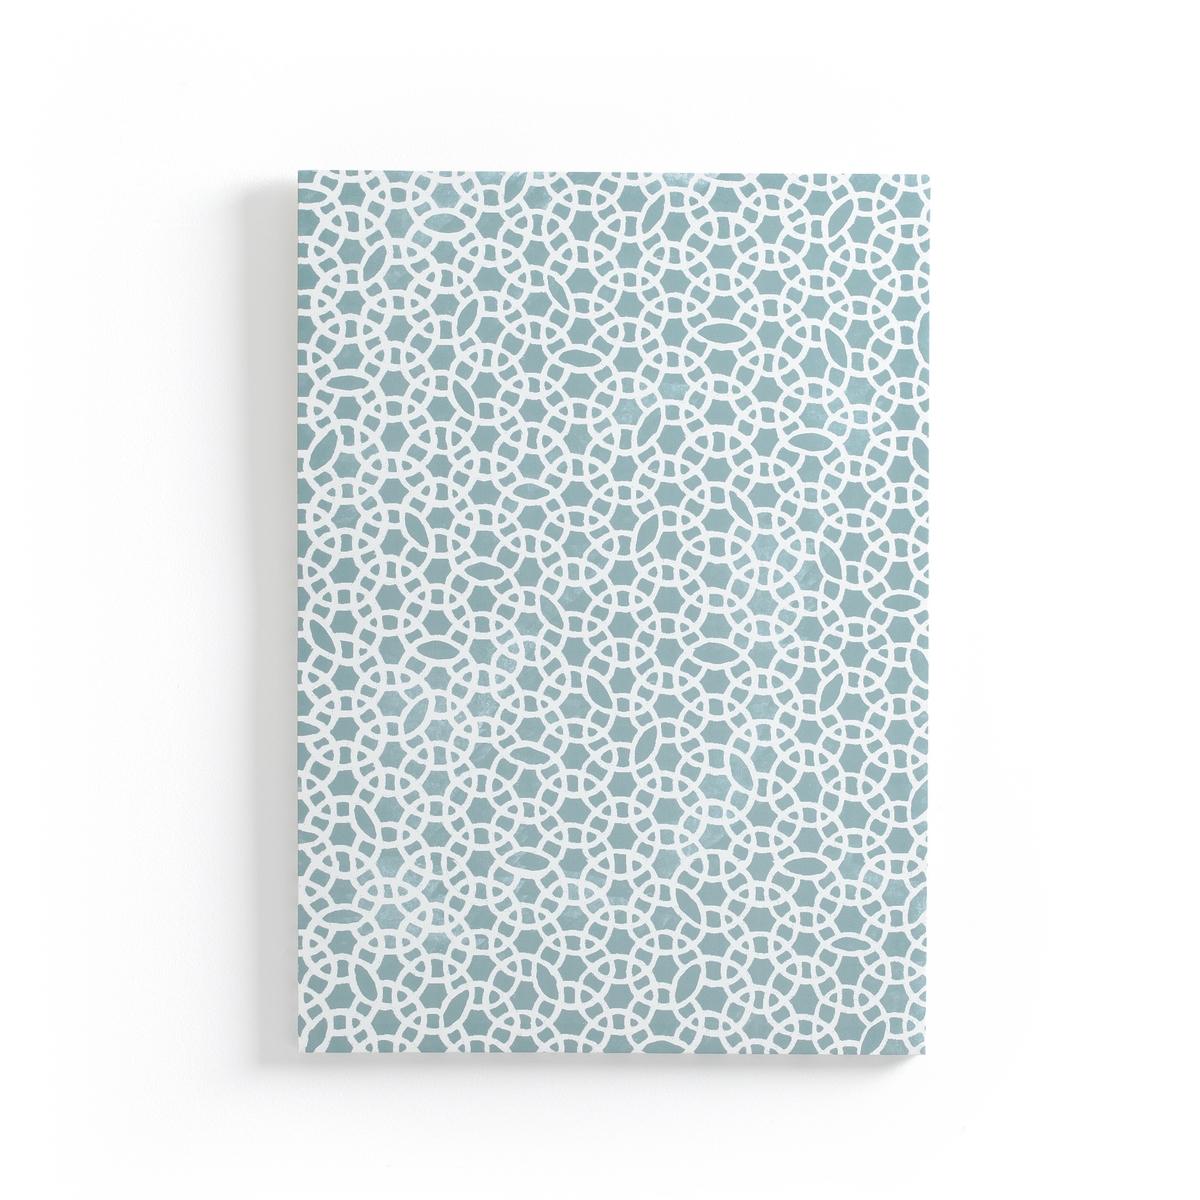 Панно с рисунком ACILIA панно brilliant набор из 3 панно 94х55 см бухта миллионеров xt 008